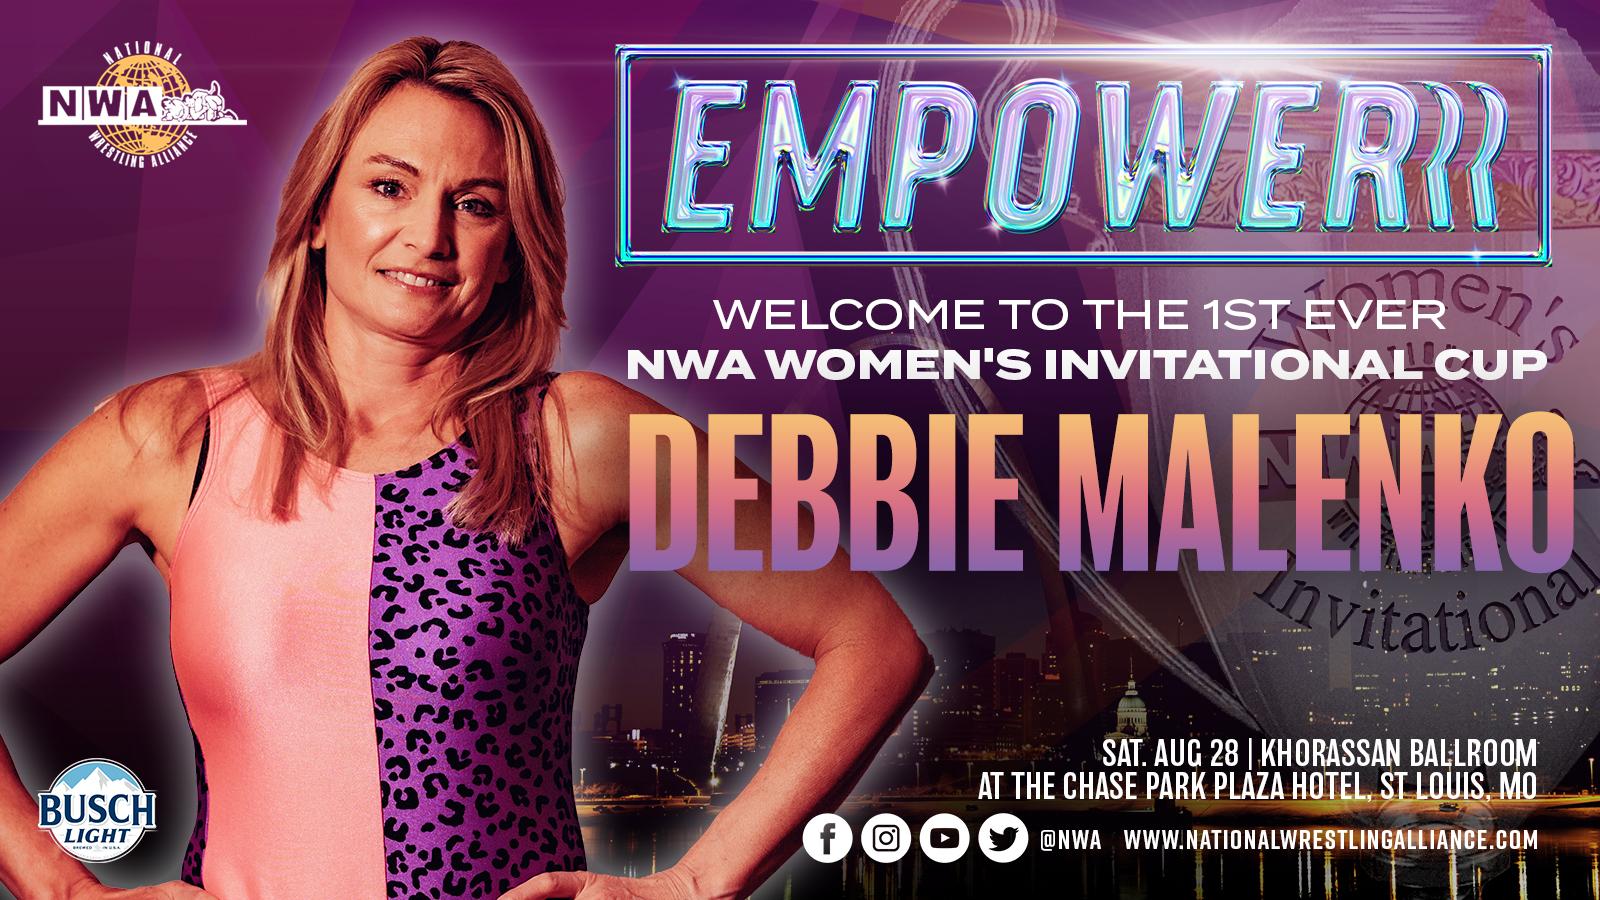 90's Super Star, Debbie Malenko To Wrestle At NWA Event